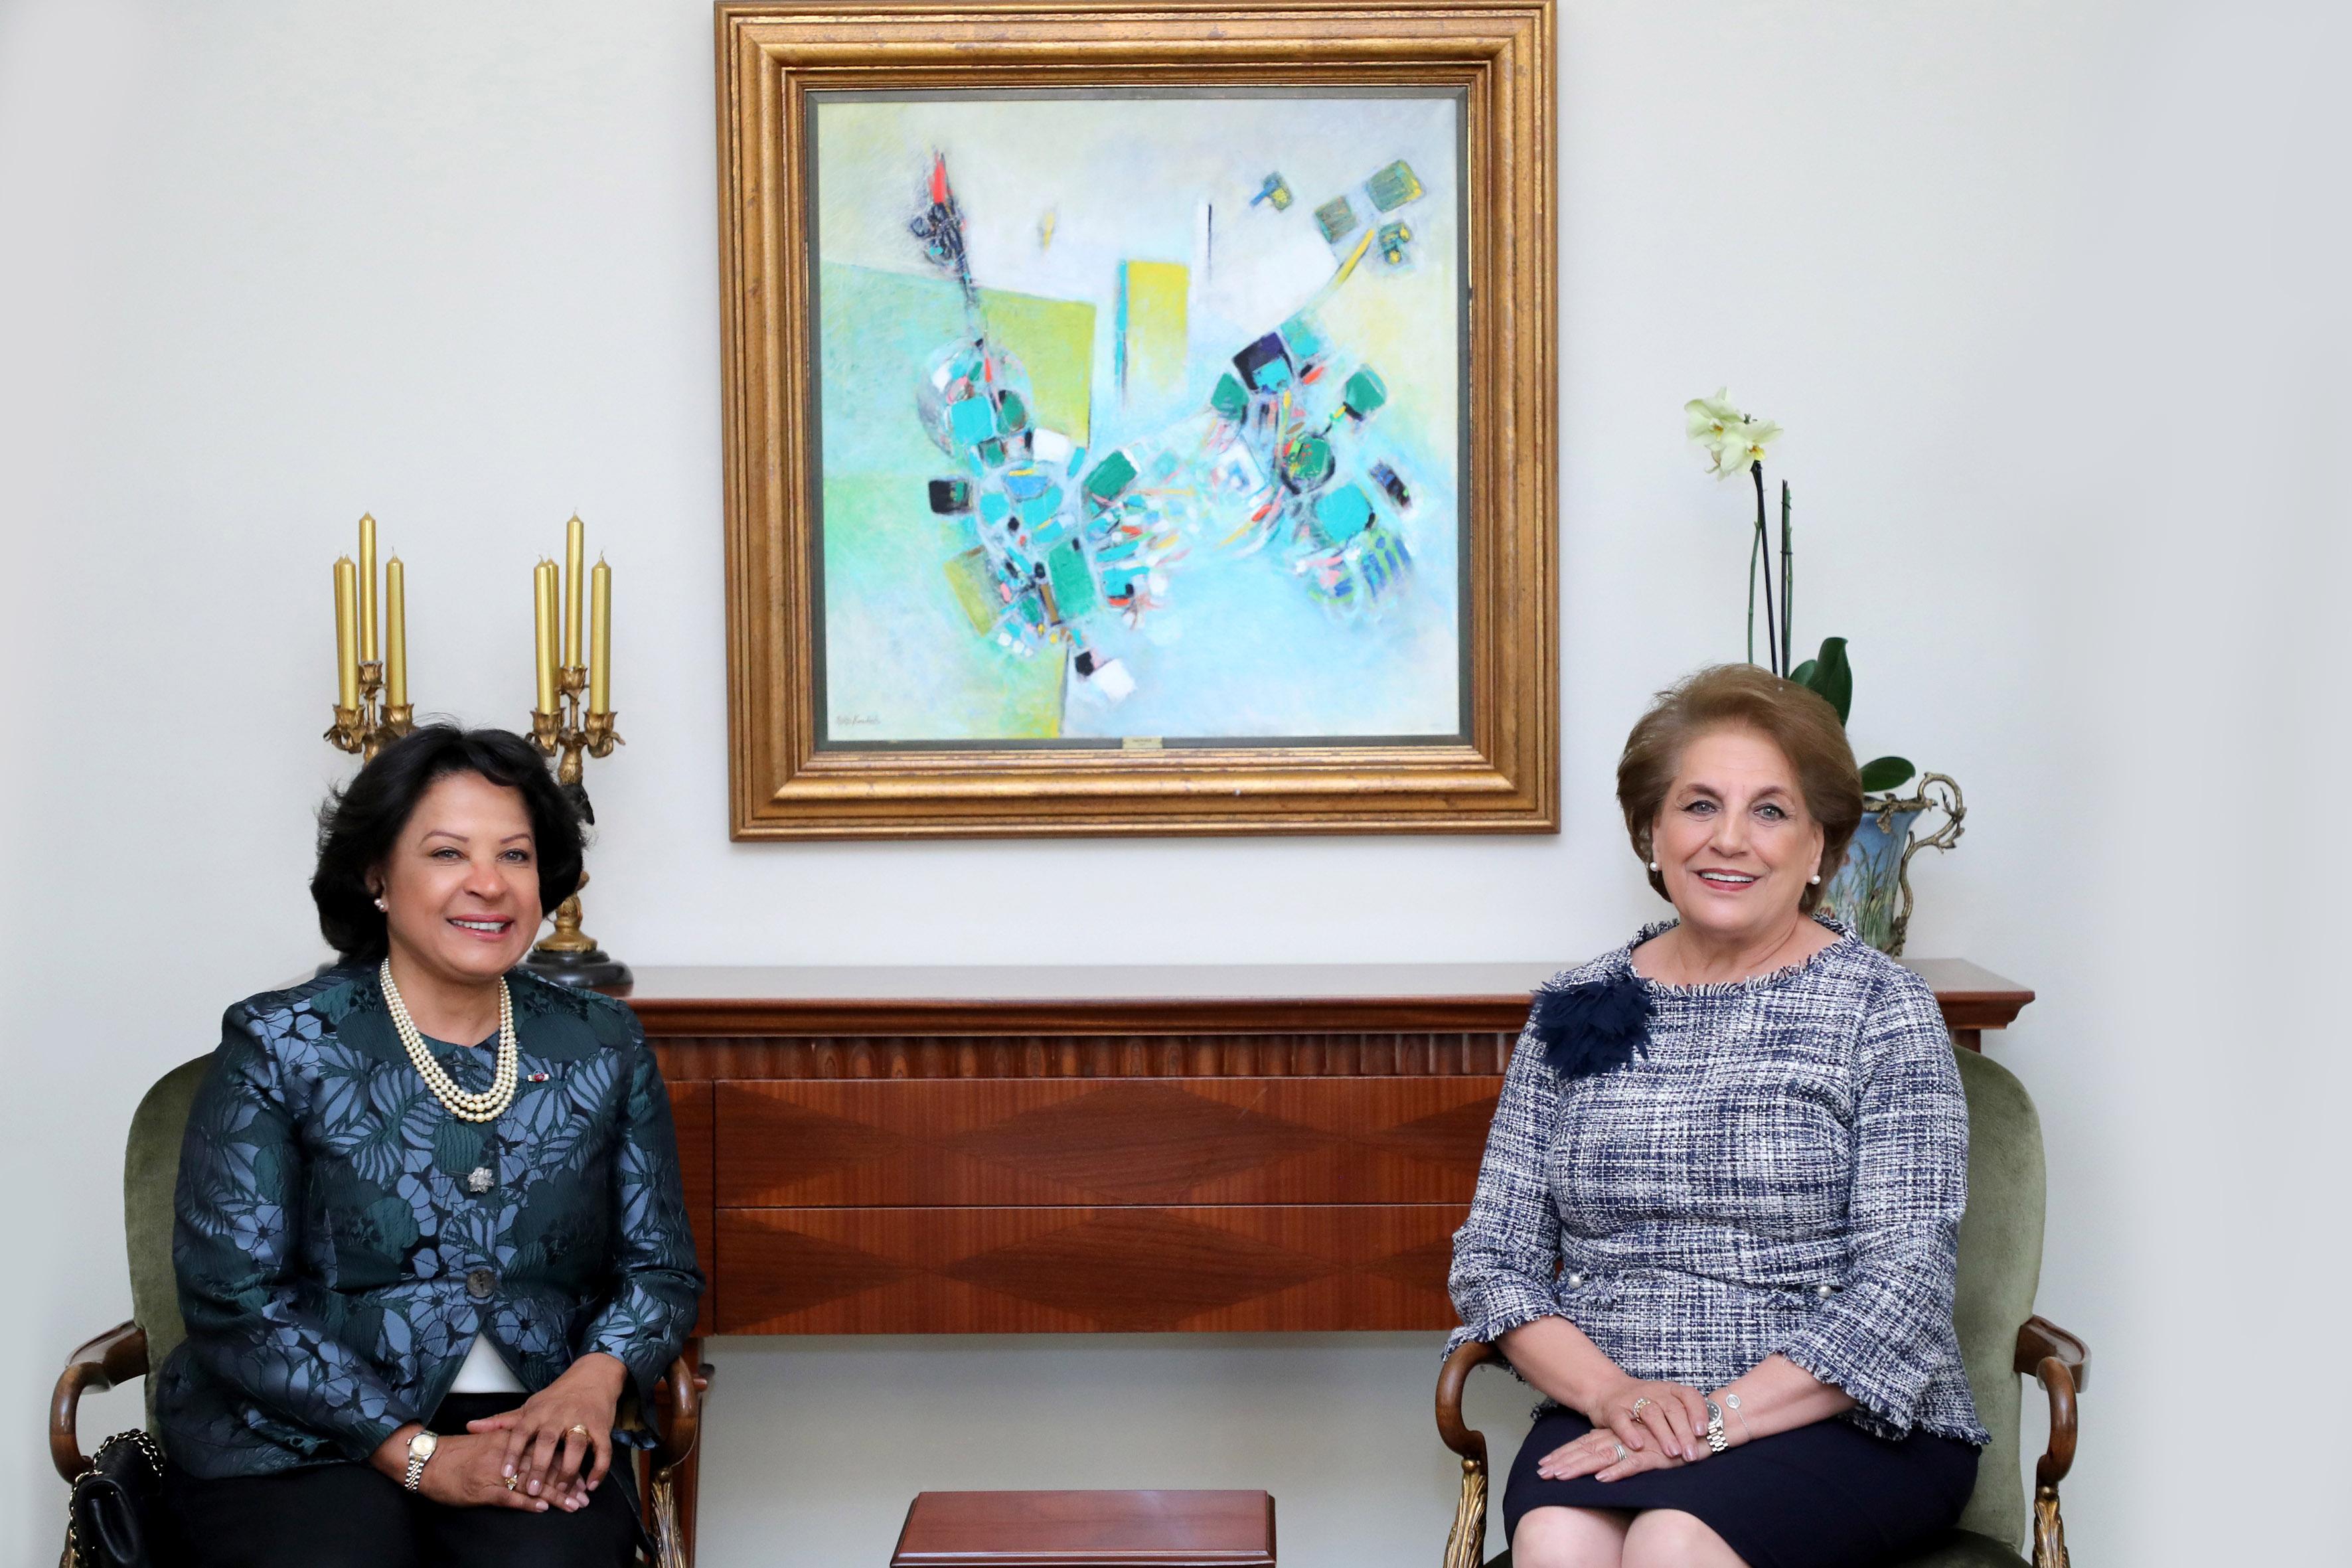 1-Mrs. Vera Lucia Ribeiro Estrala De Andrade Pinto